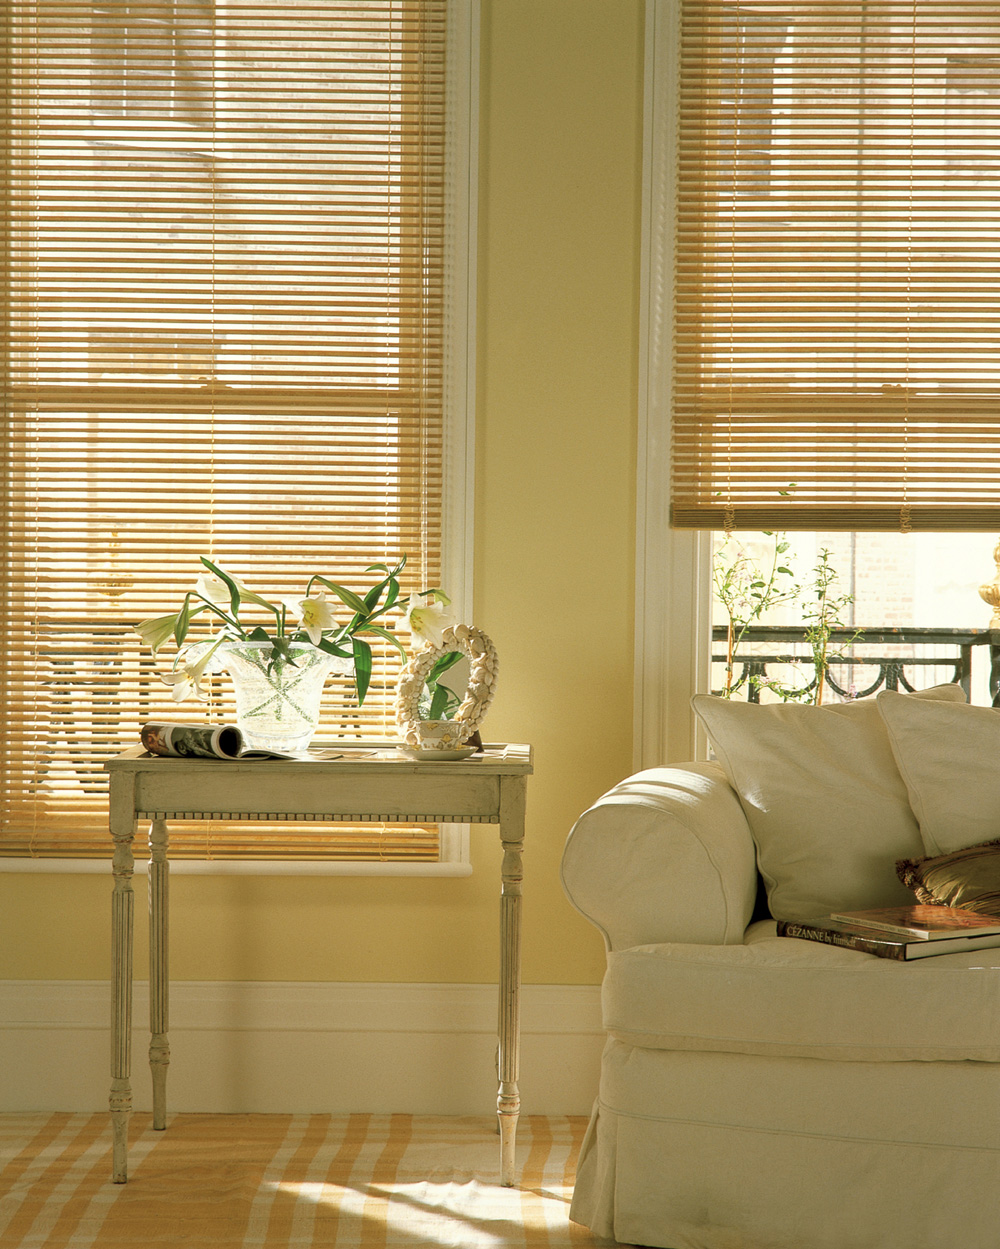 jalousie horizontale jalousette in ma anfertigung. Black Bedroom Furniture Sets. Home Design Ideas